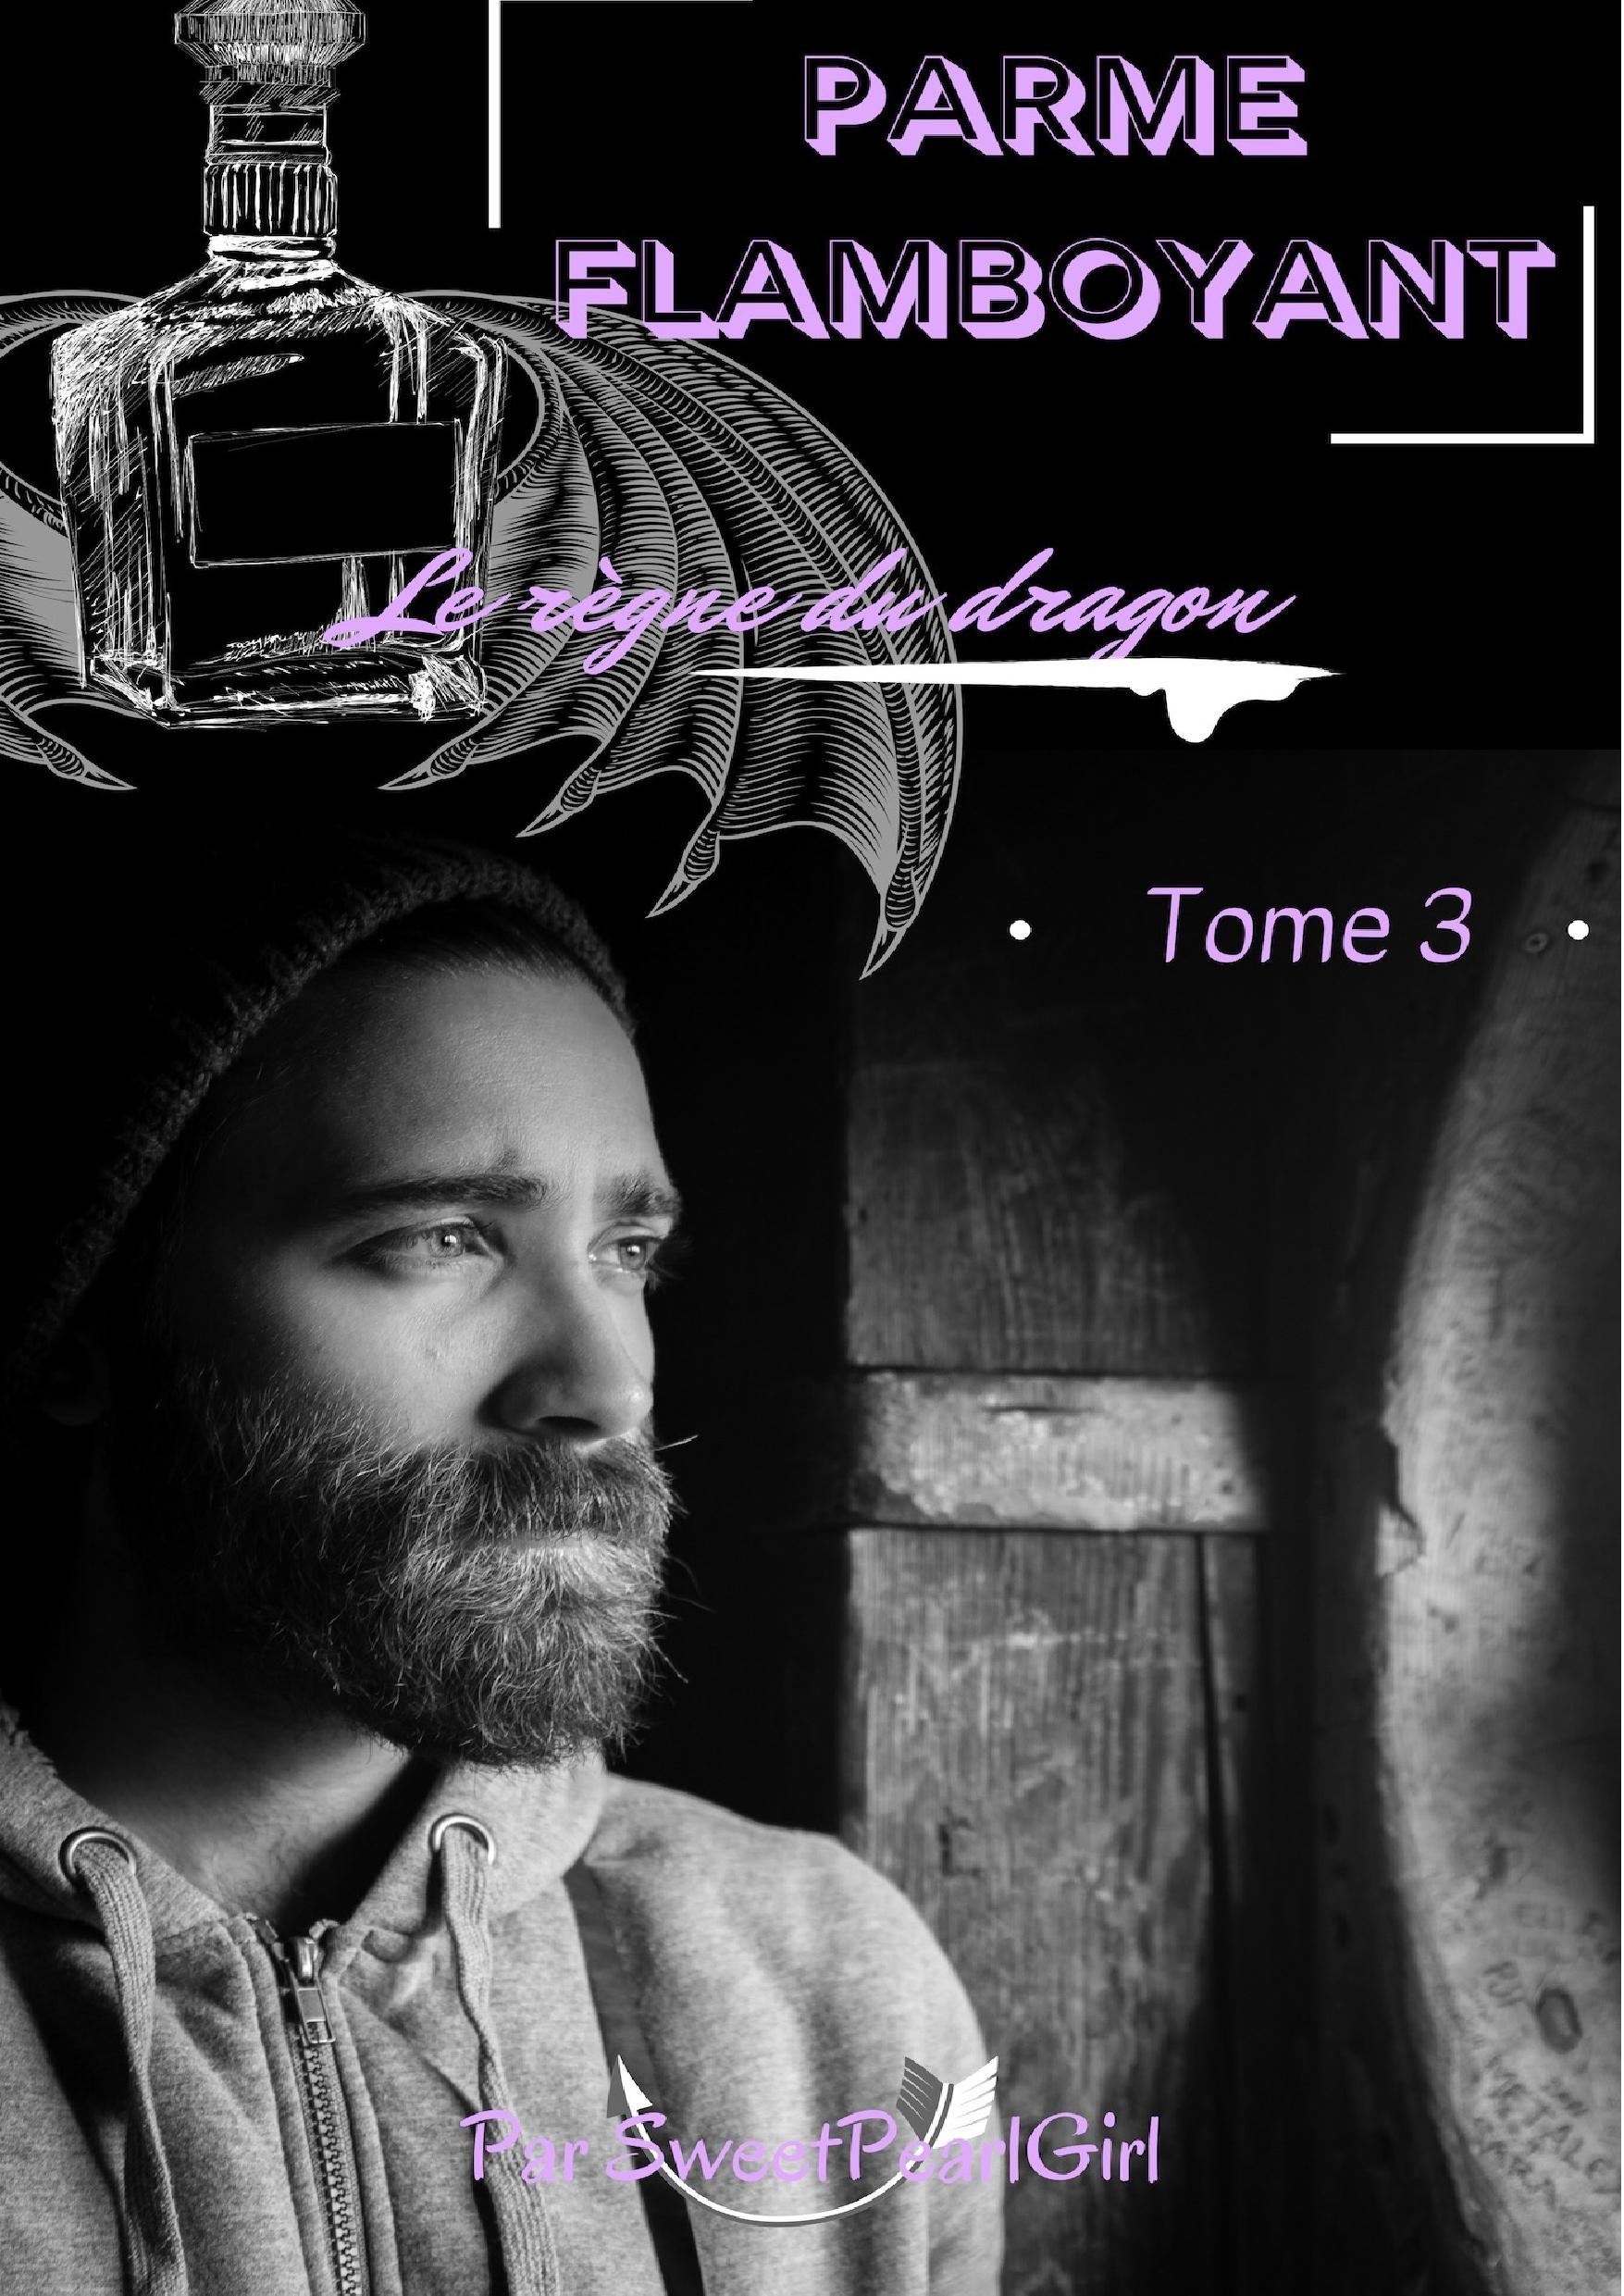 Parme Flamboyant - Tome 3